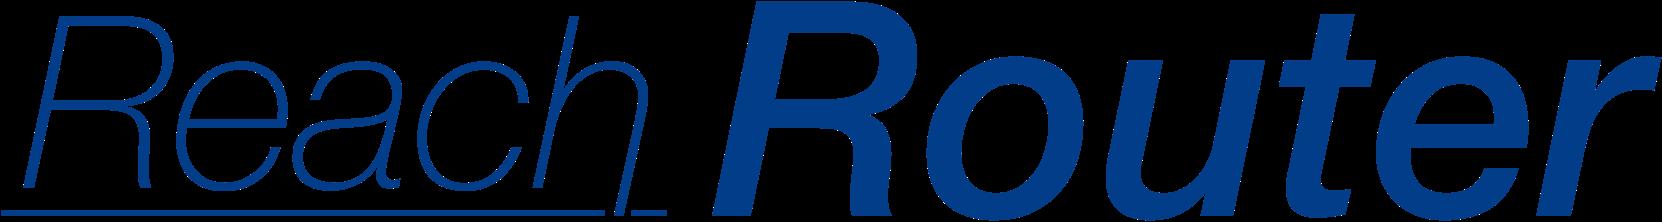 Reach Router